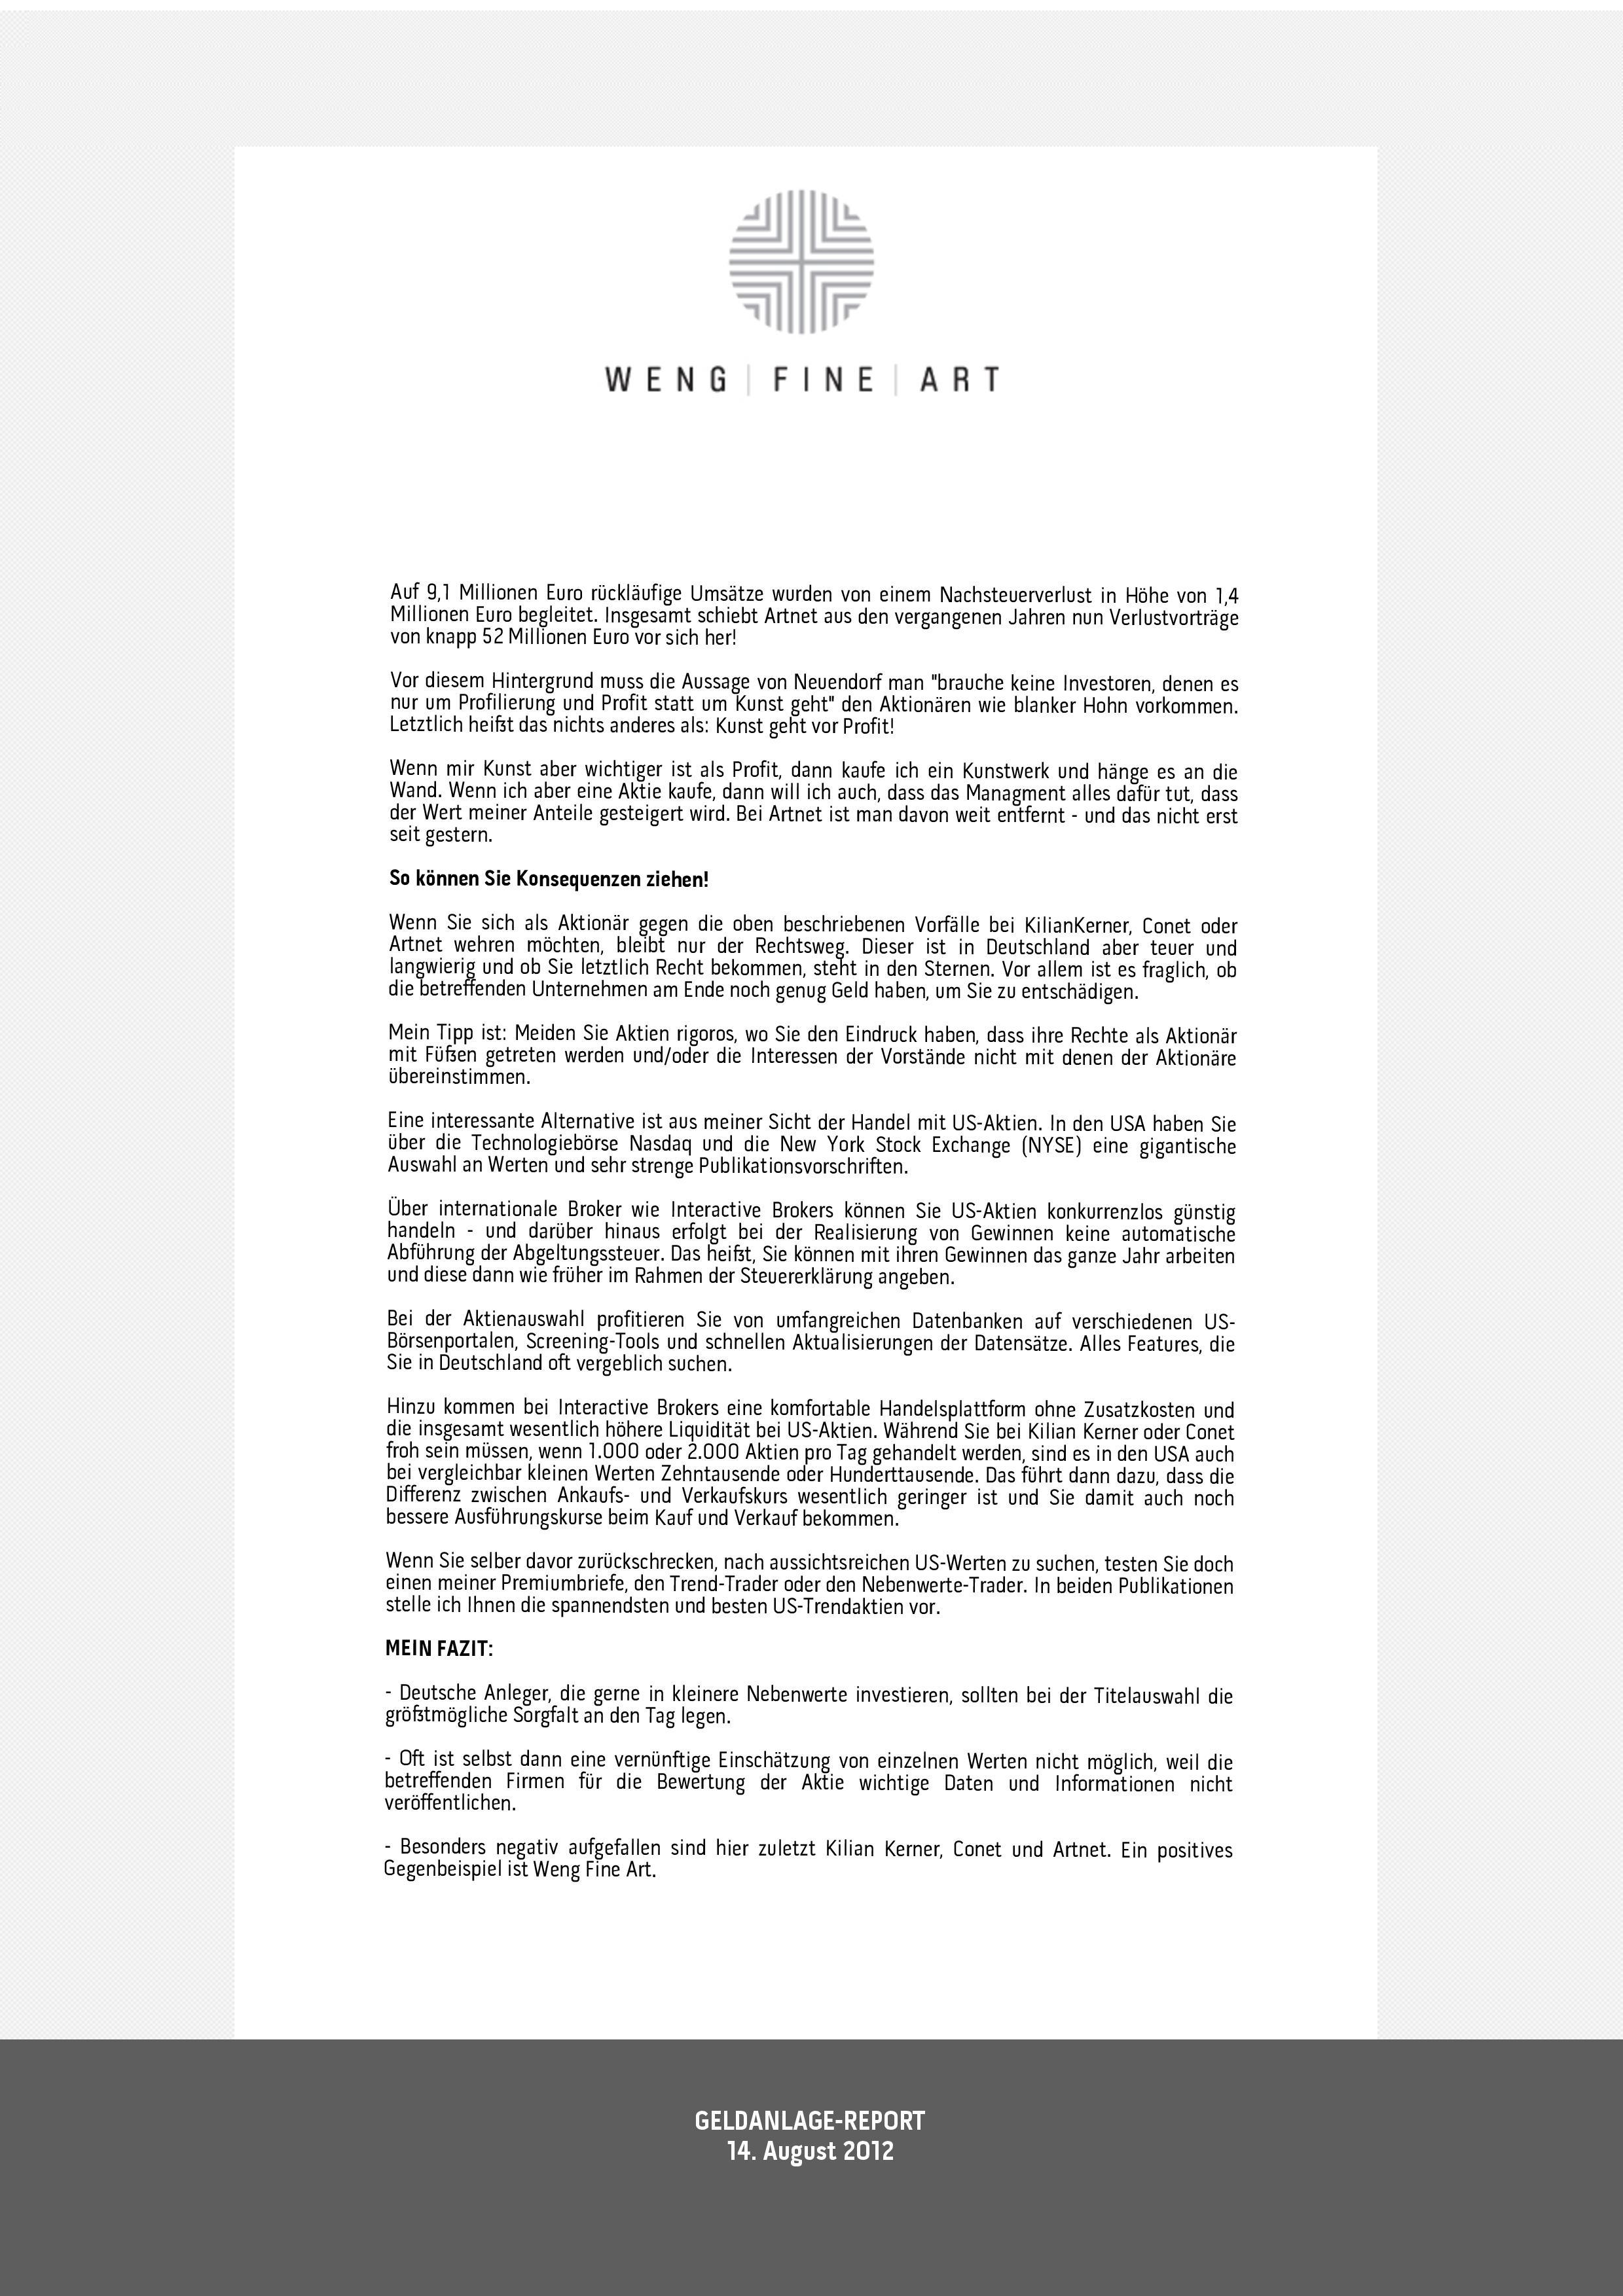 14.08.2012_Reldanlage-Report-page-003.jpg#asset:3538